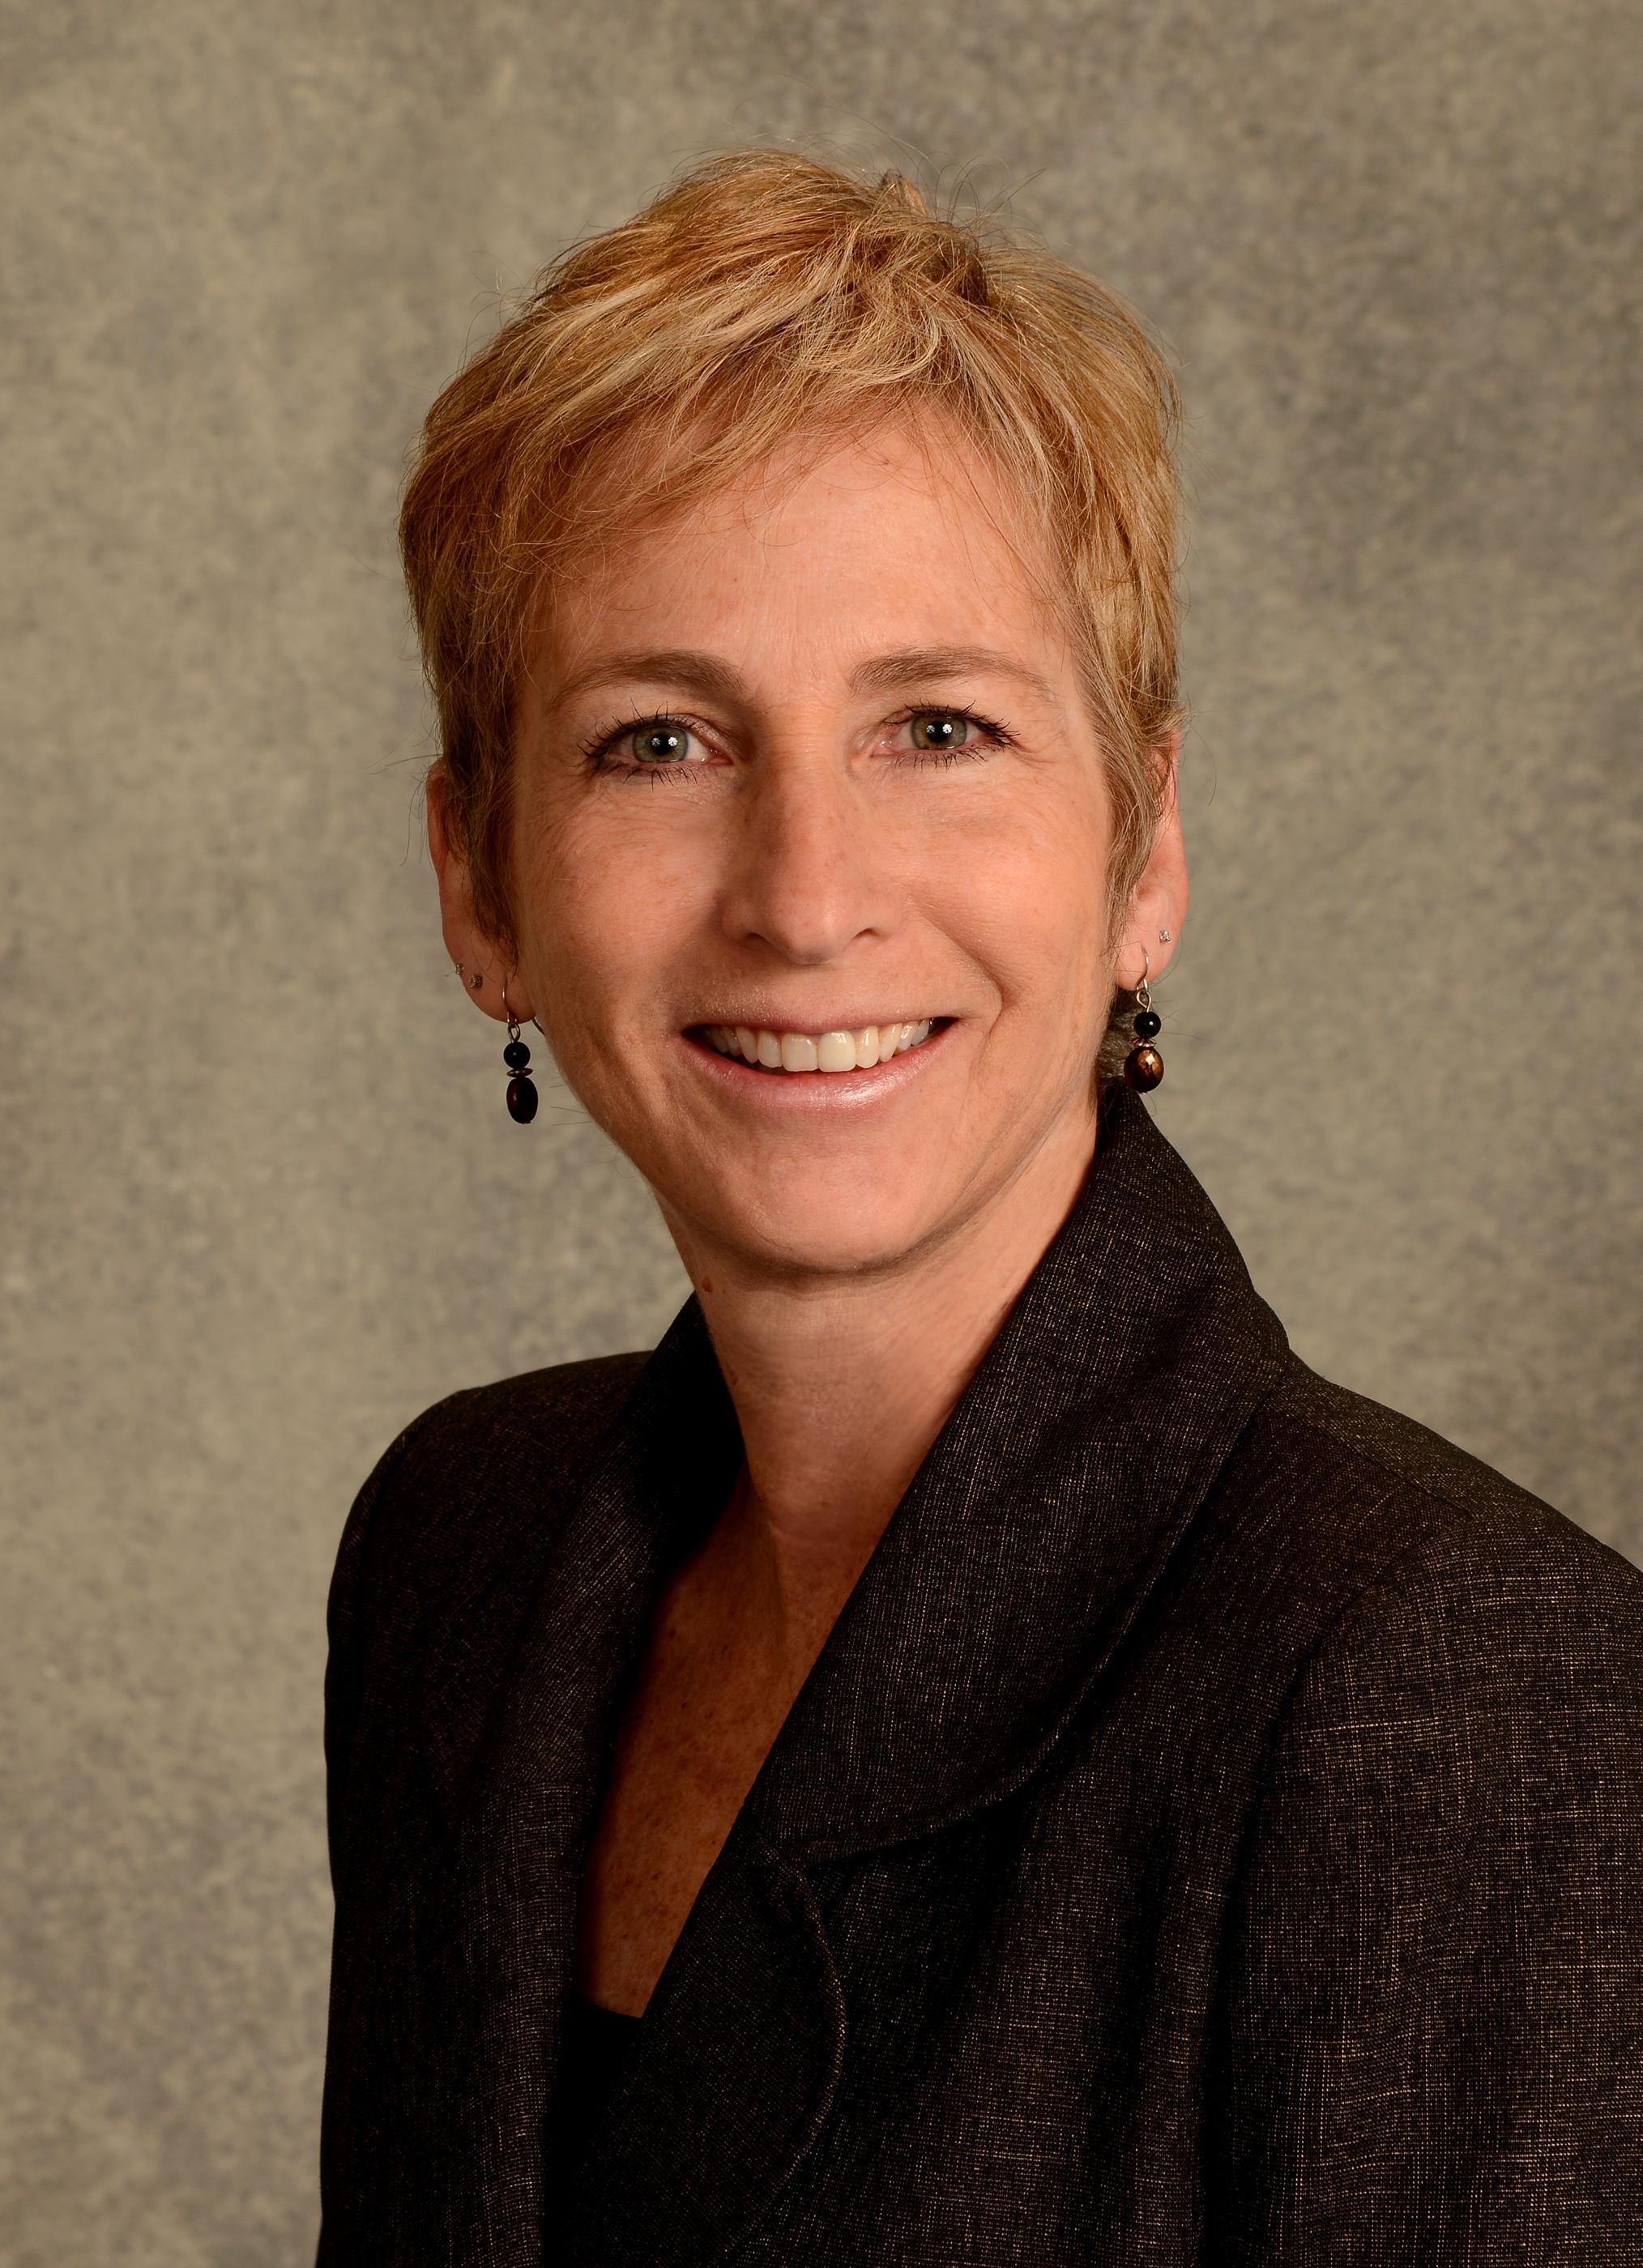 Nationally Known Pediatric Health Leader Joins Stanford Children's